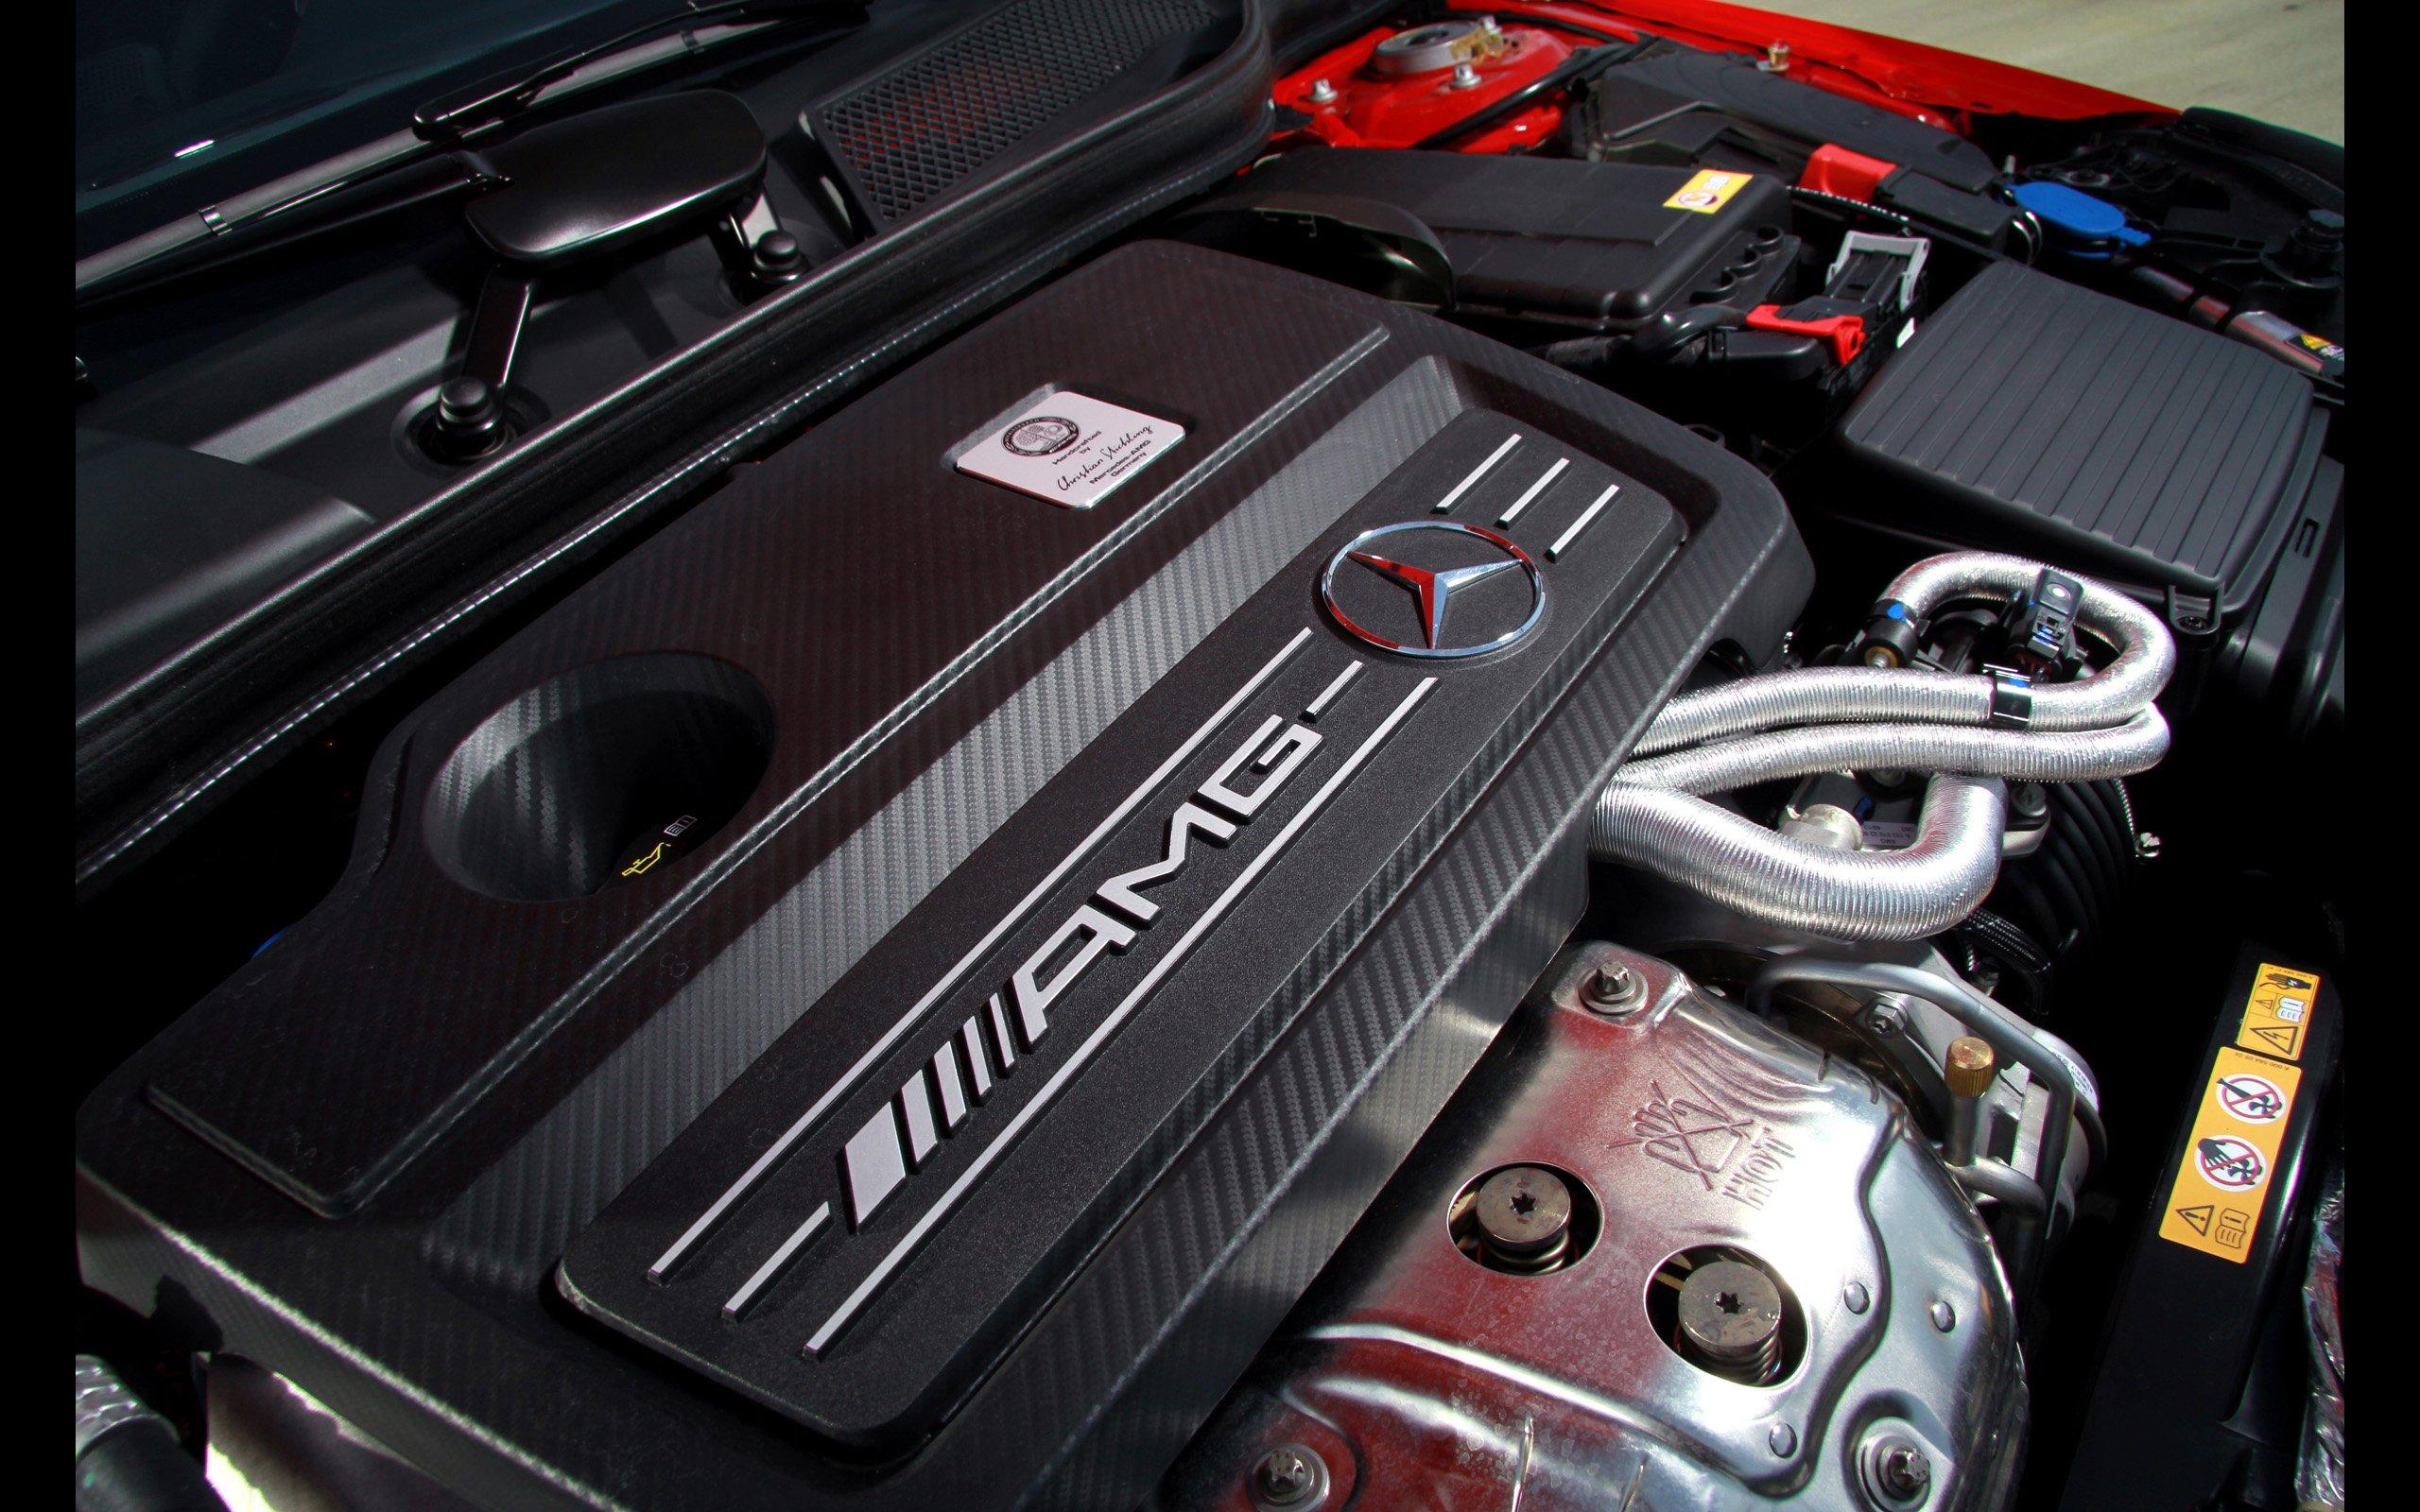 Original Mercedes C Amg Battery